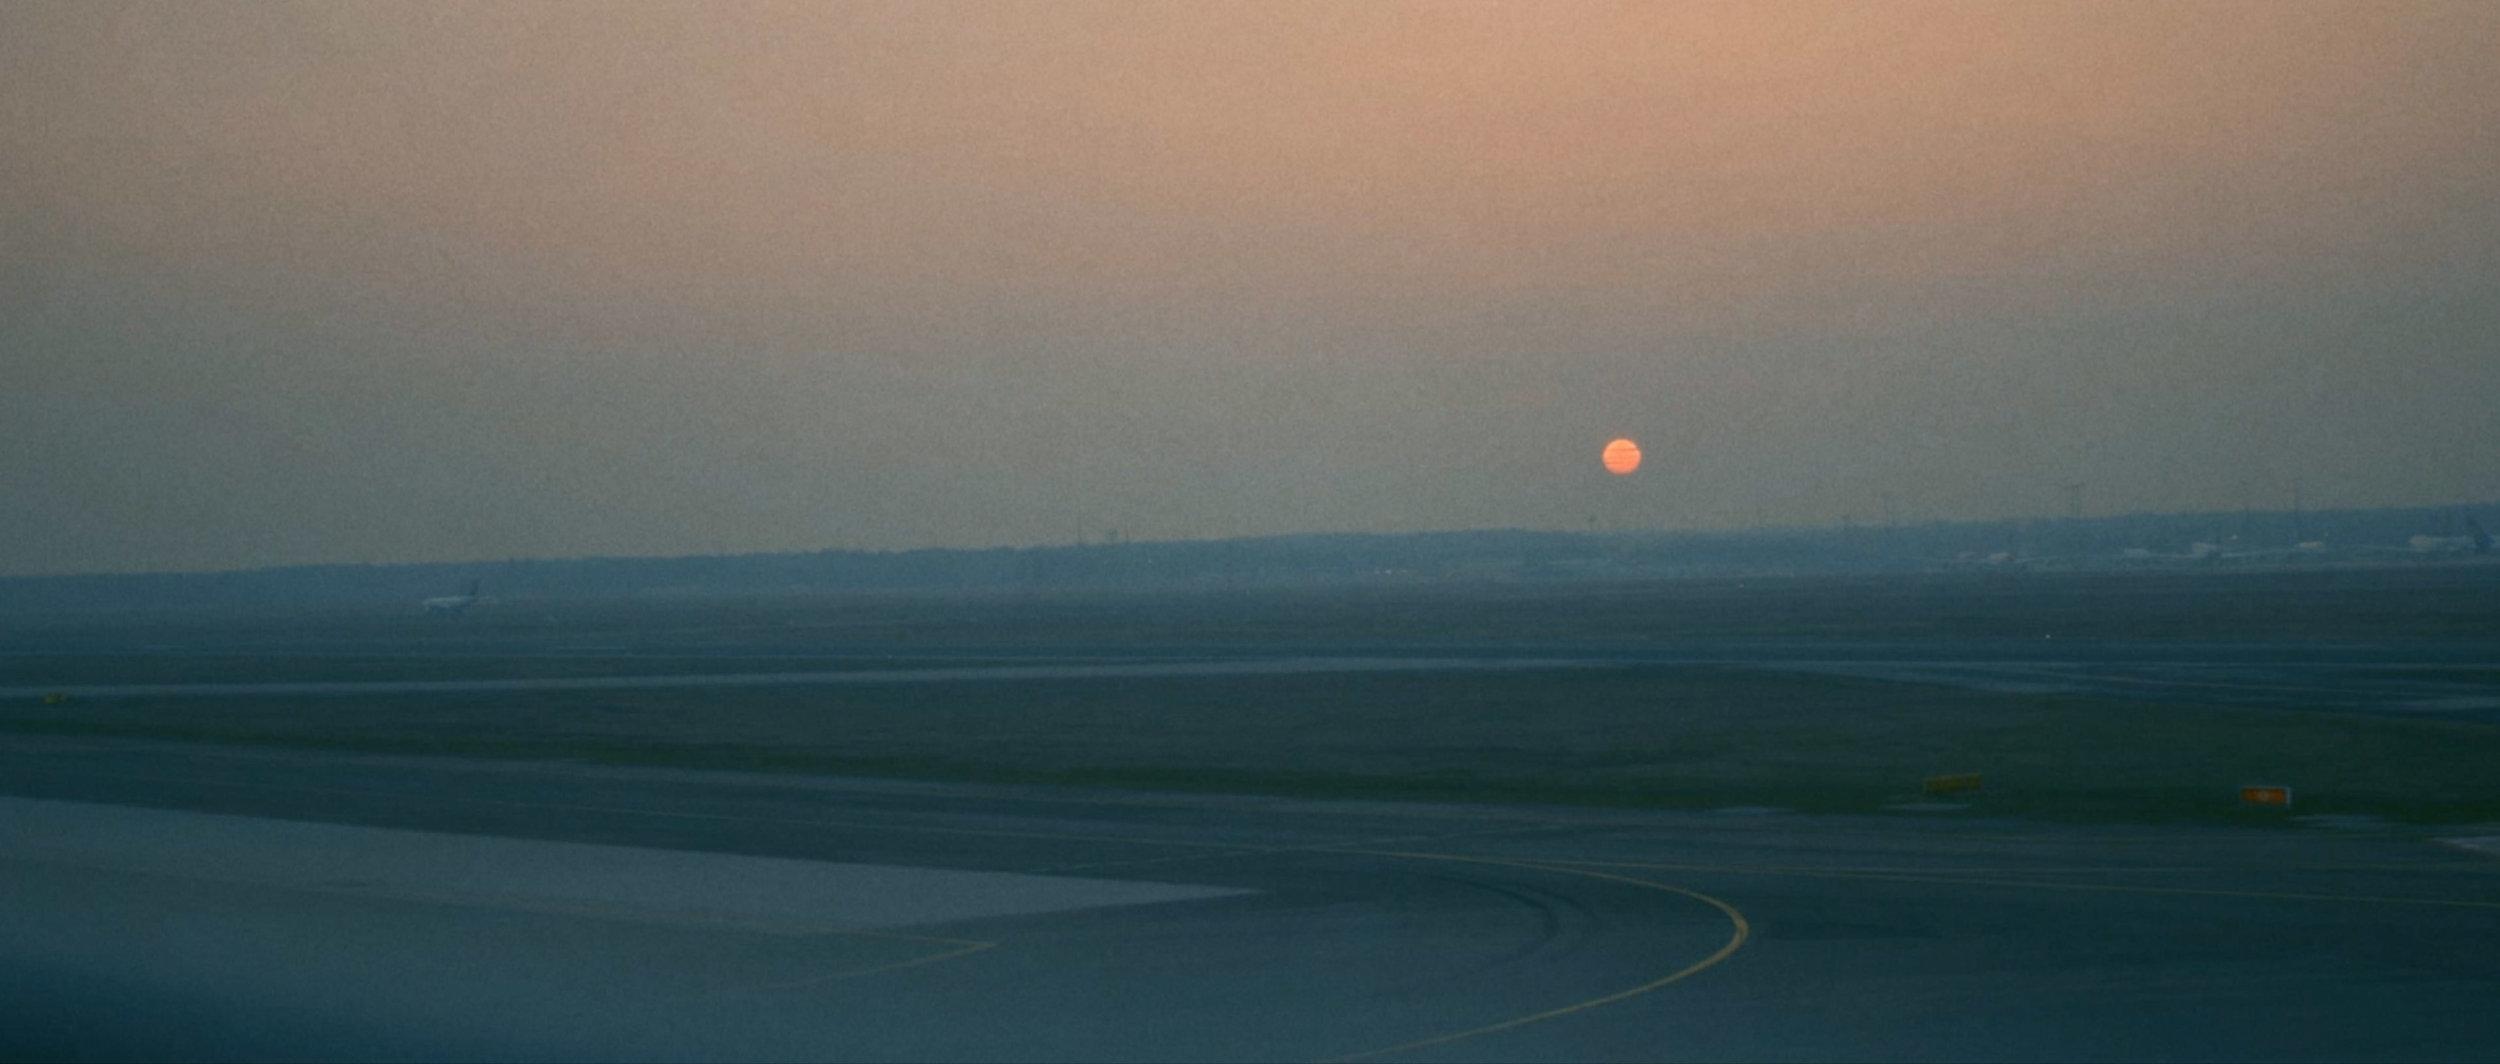 Lufthansa-Airplane-New-Airport-Surface-Beklebung-Travel-TakeOff_11.jpg